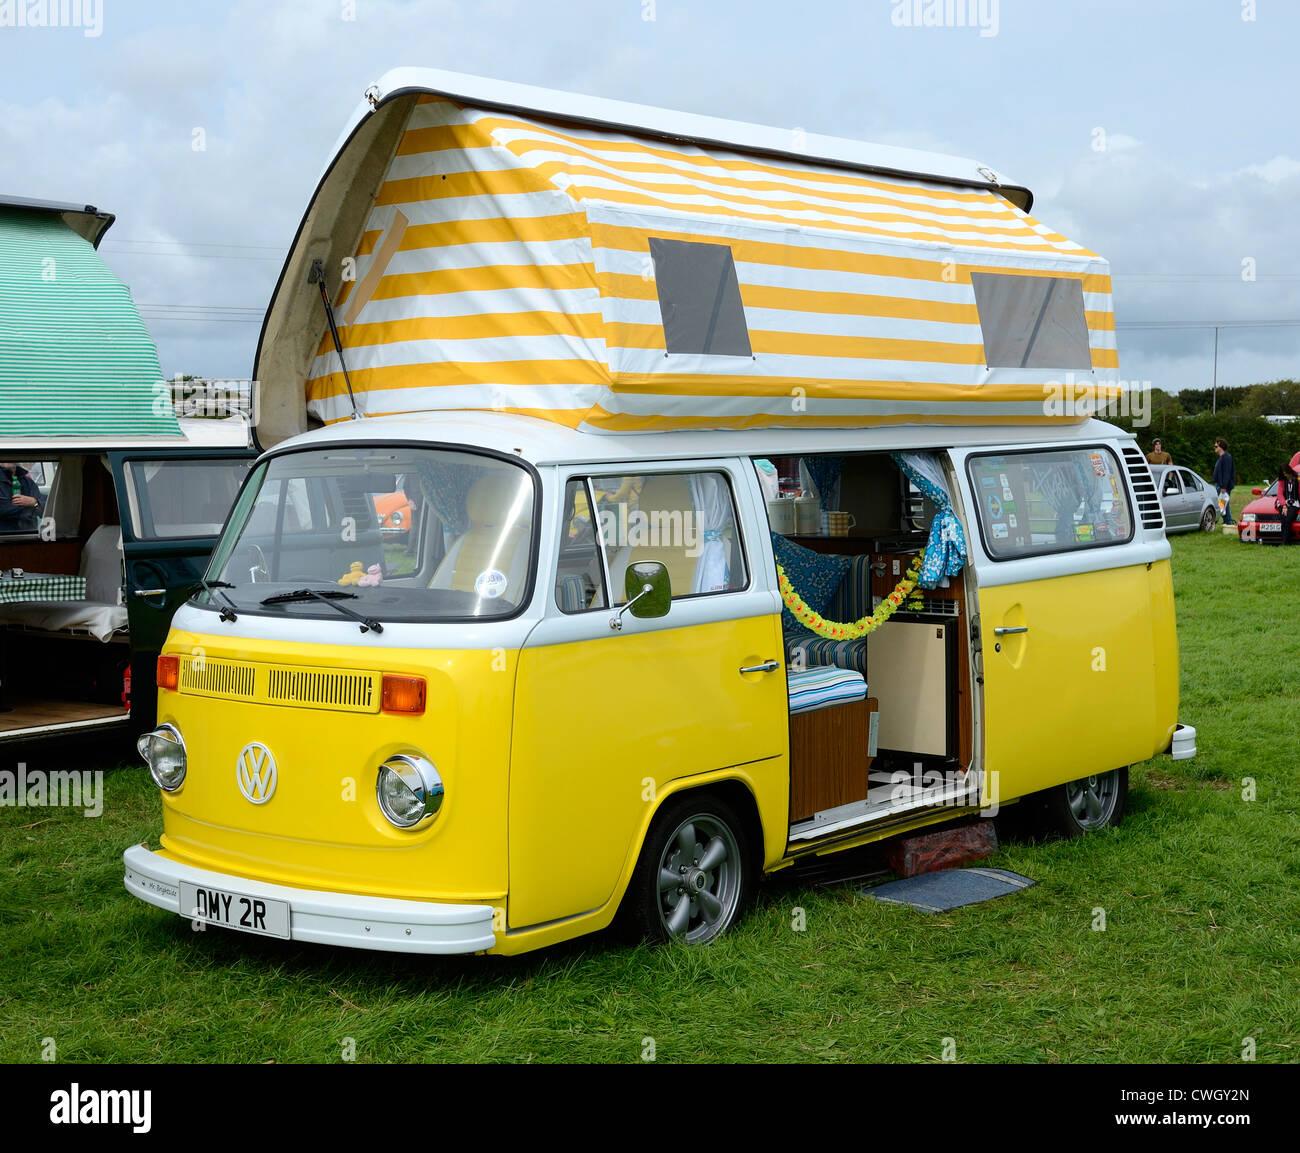 A vw camper van at a volkswagen rally in cornwall uk